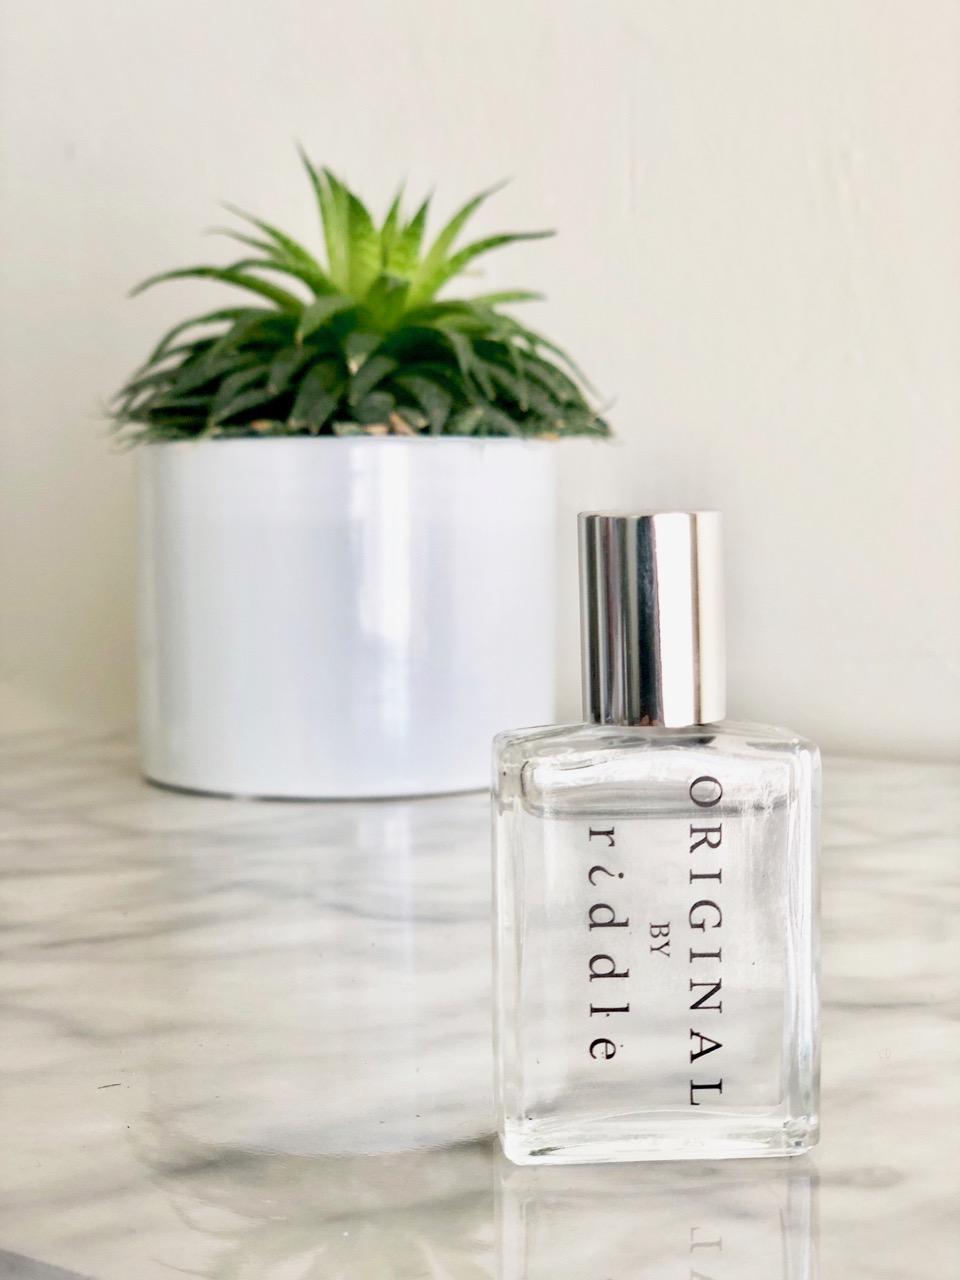 aa9bd72a91 Spotlight On  Riddle Perfume Oil Original Scent